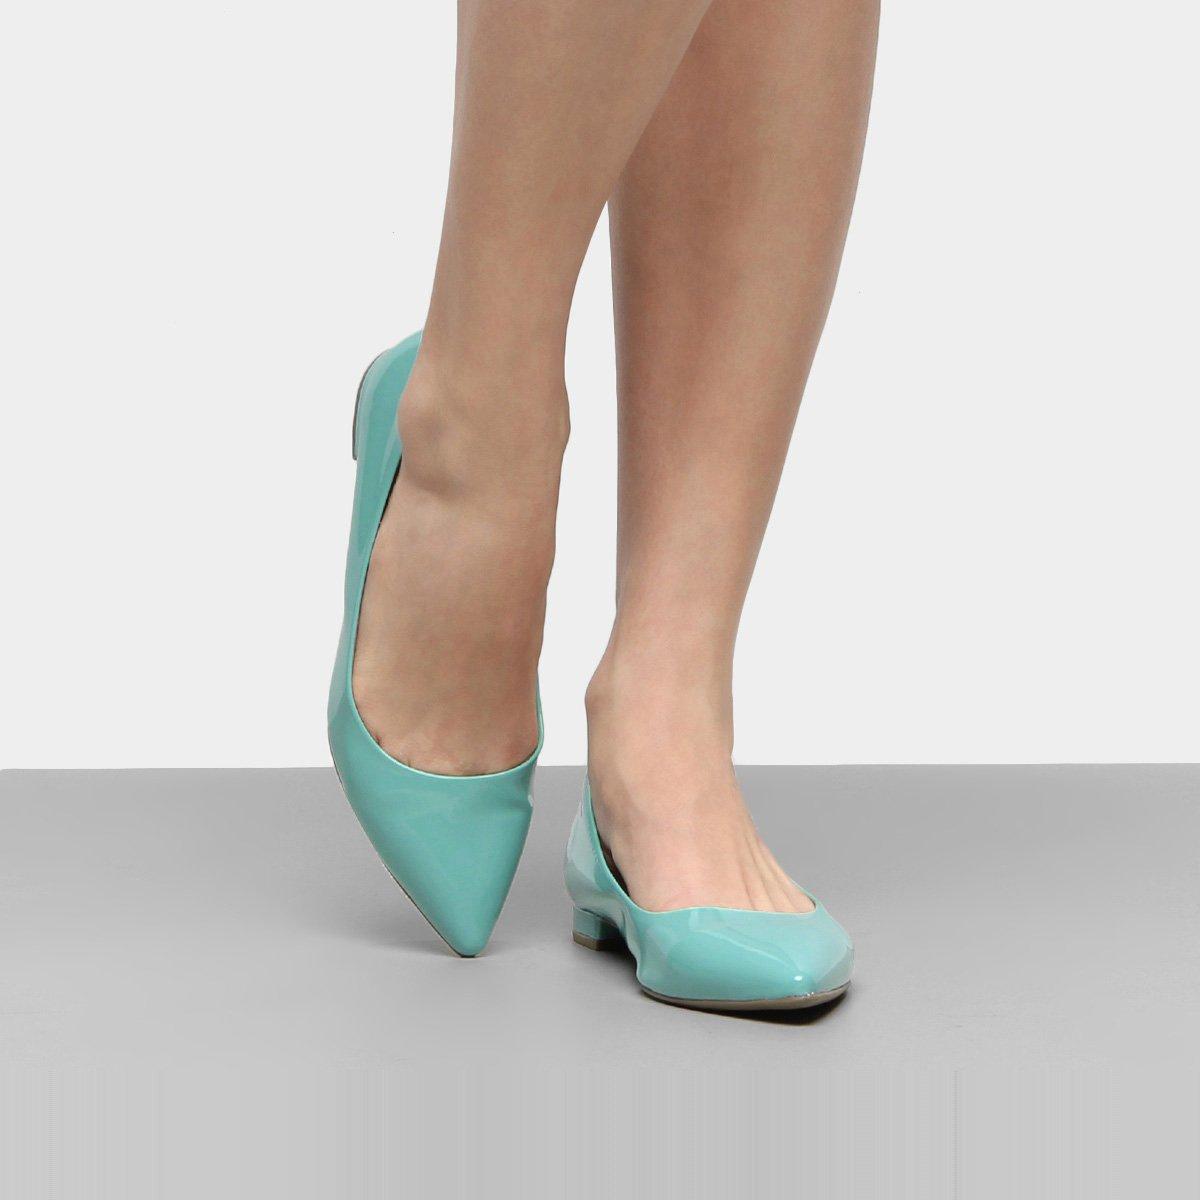 0924b4394 Sapatilha Somoda Verniz Feminina - Azul Claro - Compre Agora